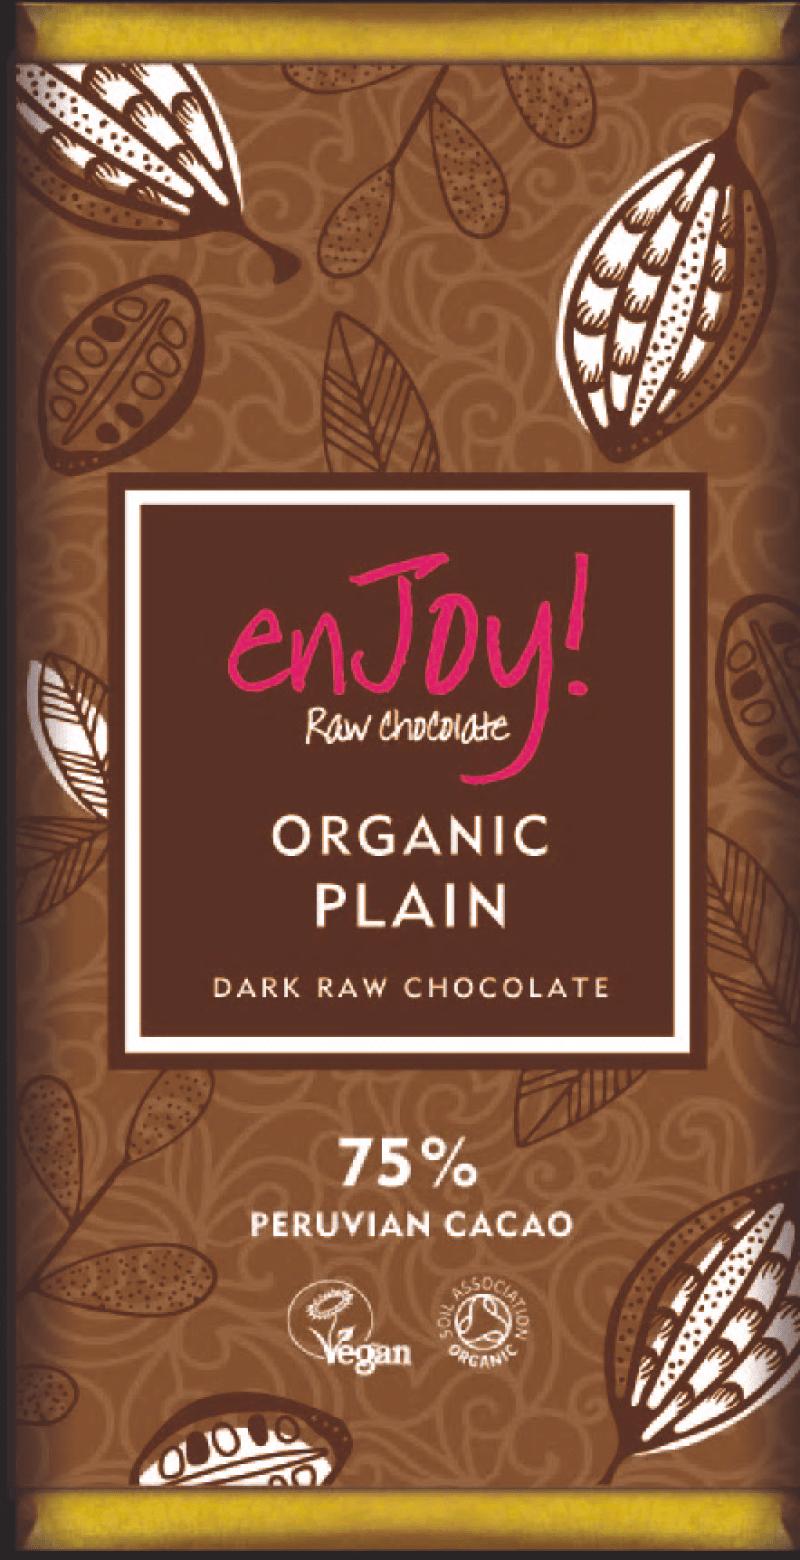 Enjoy! - Dark Raw Chocolate